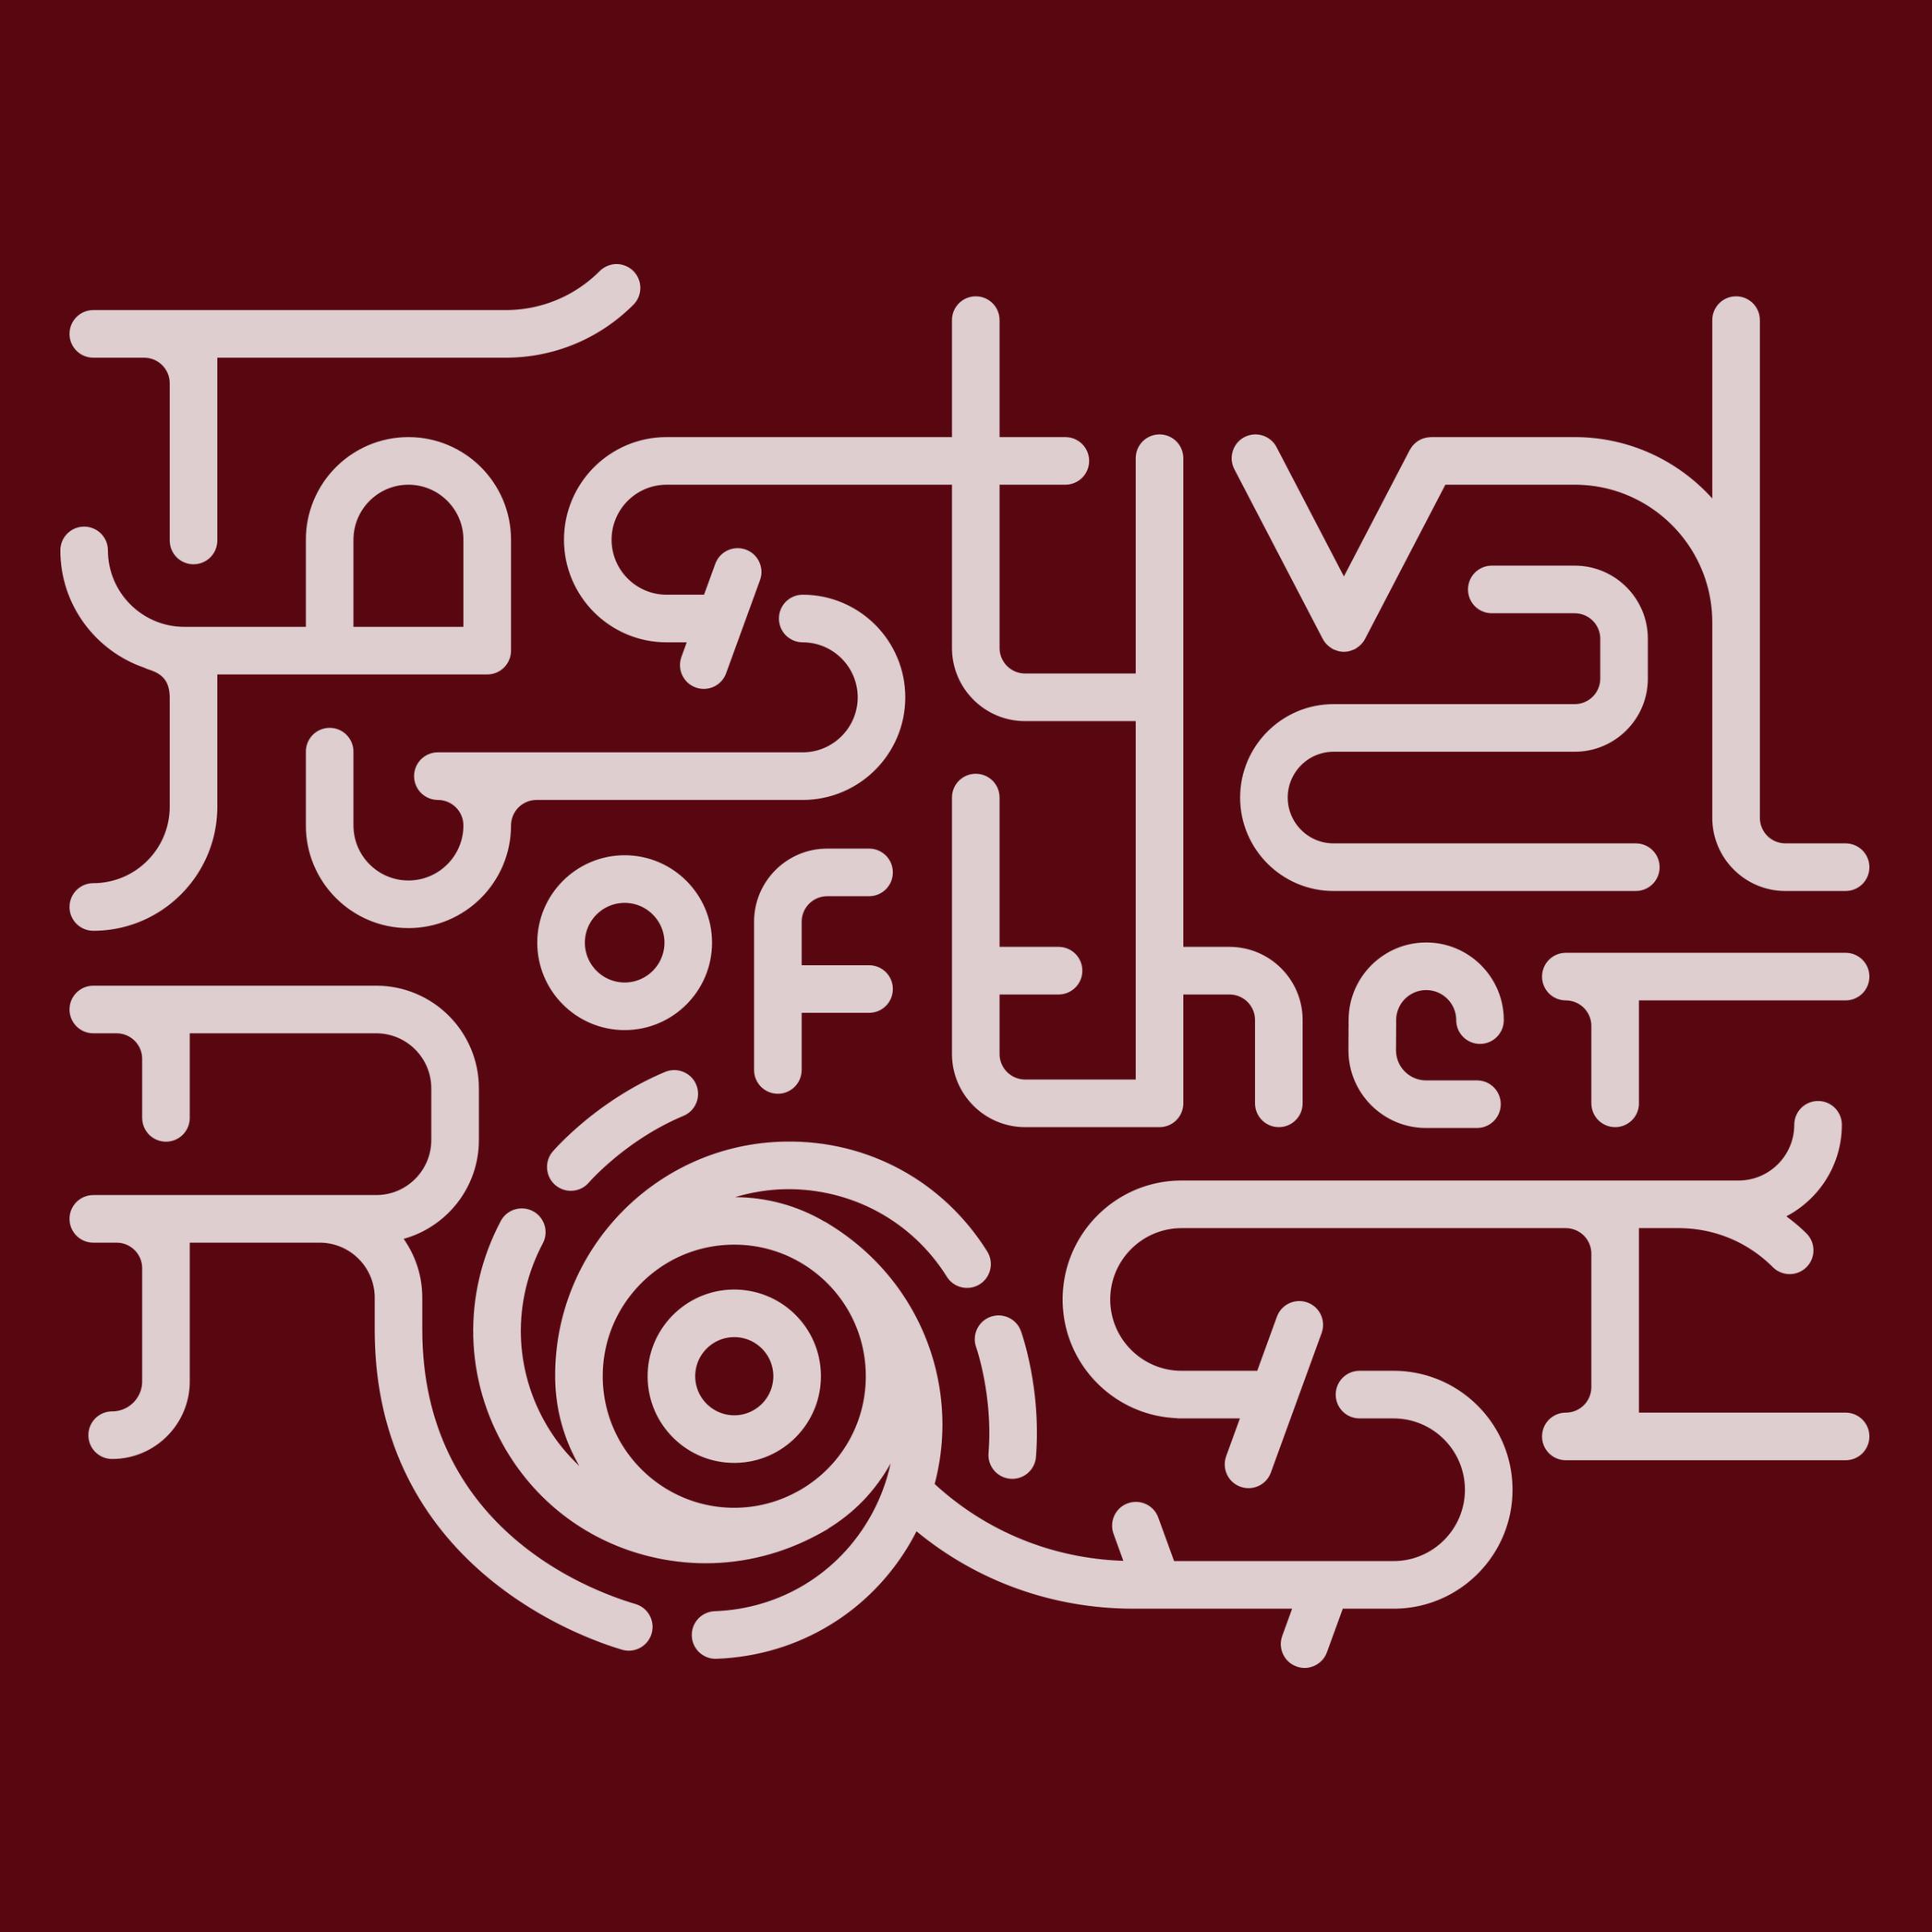 Festival of the Rose